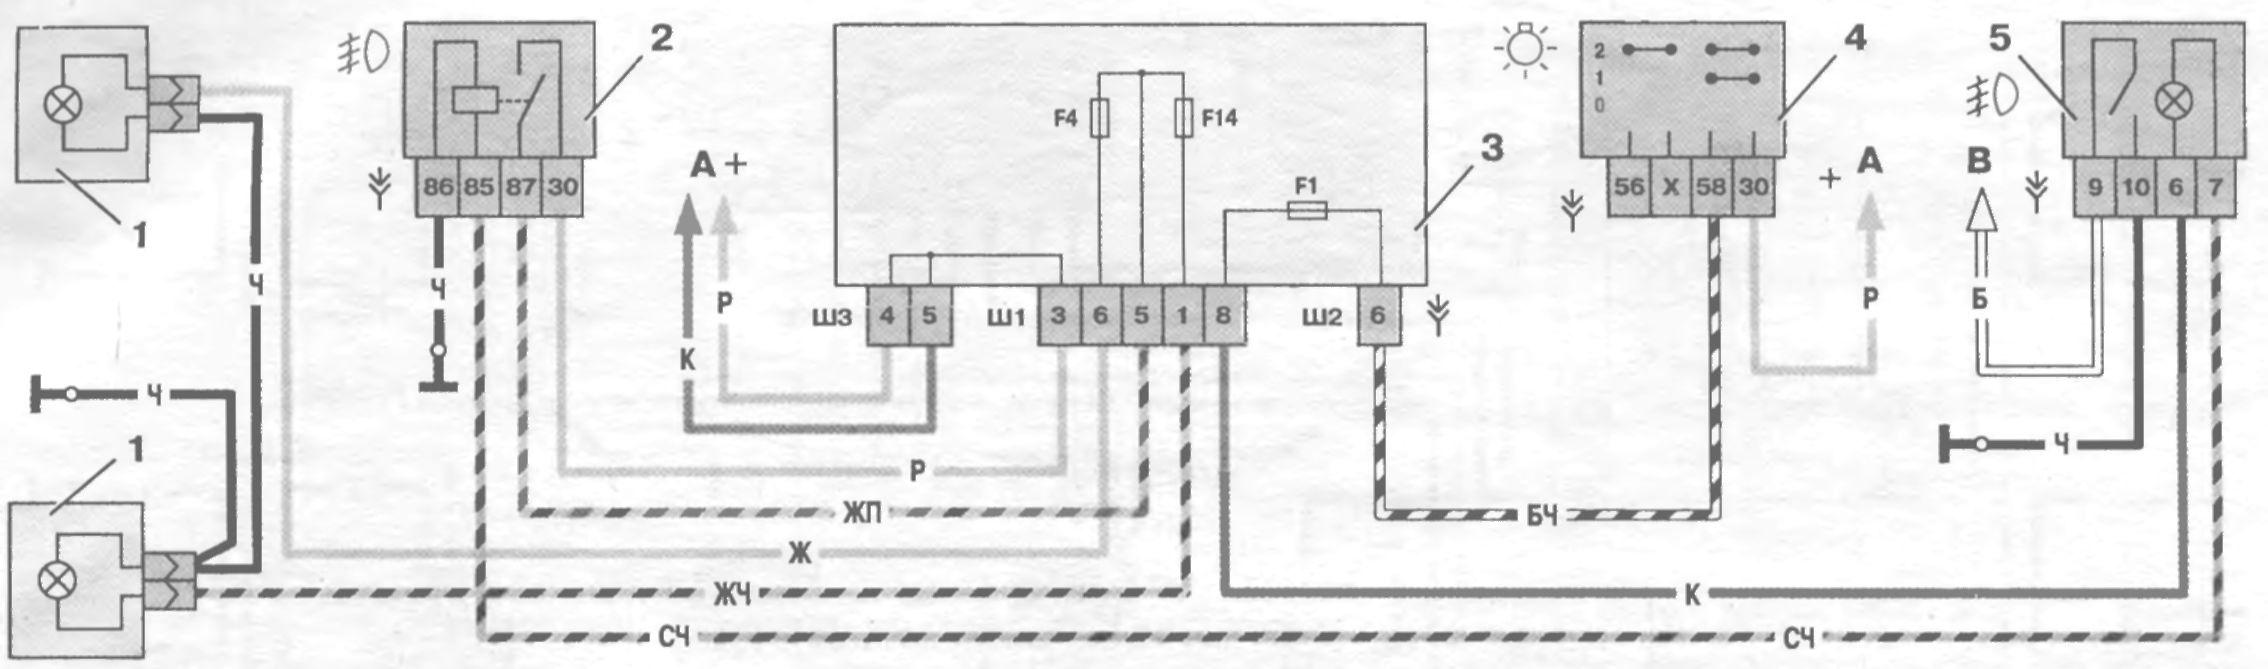 Фото №6 - схема подключения противотуманных фар ВАЗ 2110